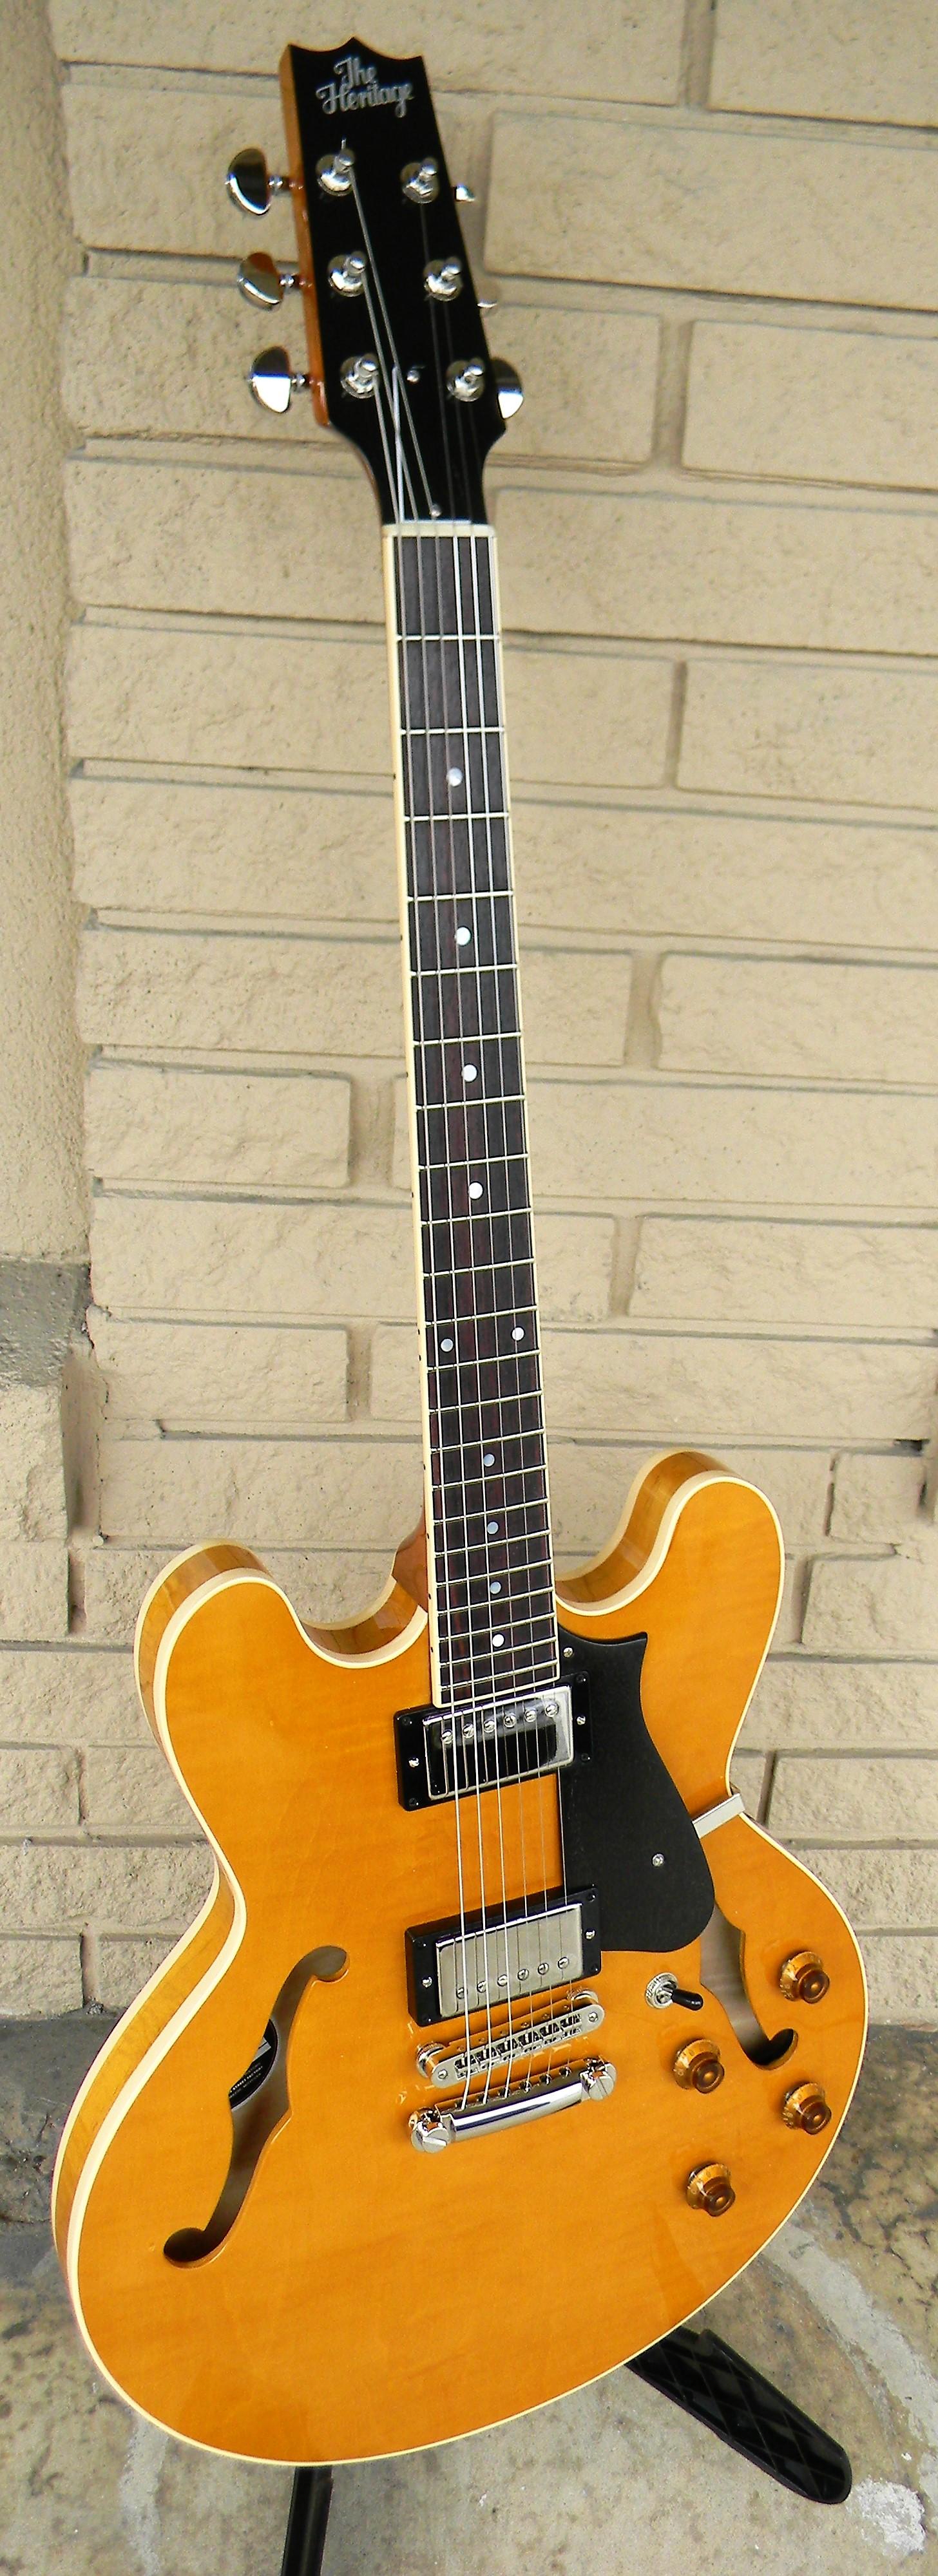 dscn7773 san antonio guitar store guitar tex. Black Bedroom Furniture Sets. Home Design Ideas